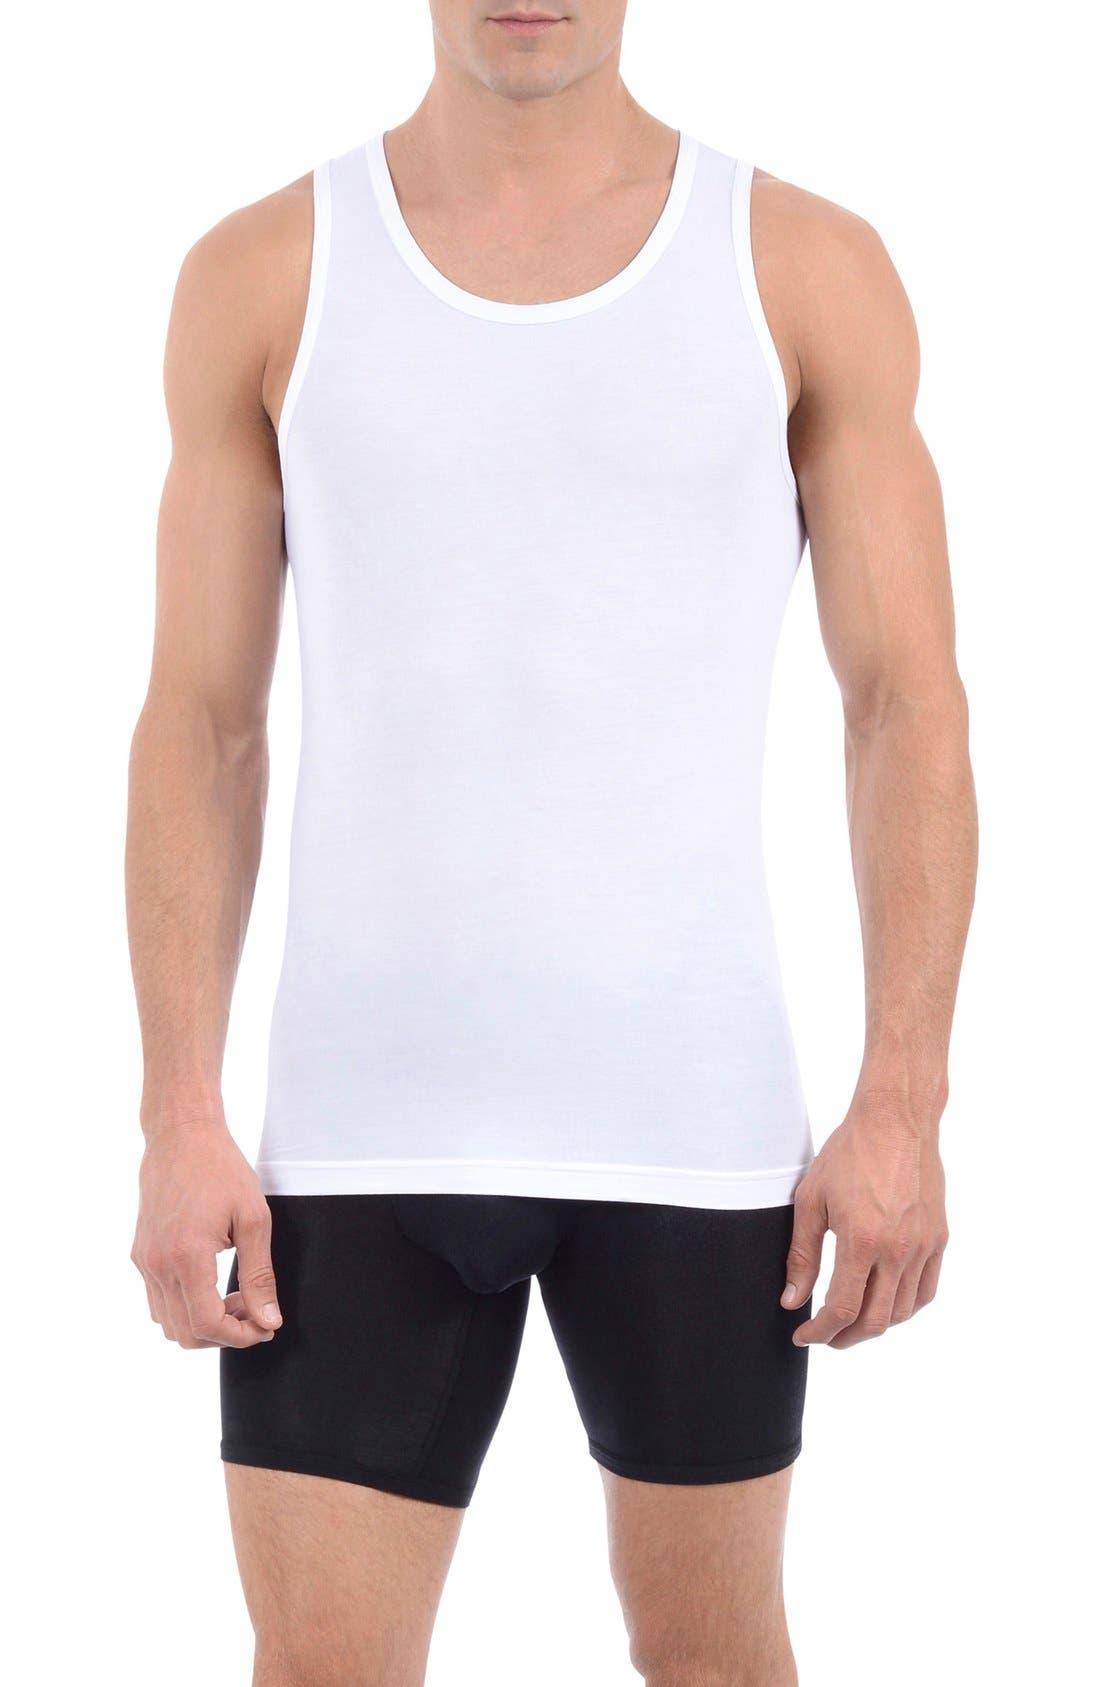 TOMMY JOHN, Second Skin Tank Undershirt, Main thumbnail 1, color, WHITE